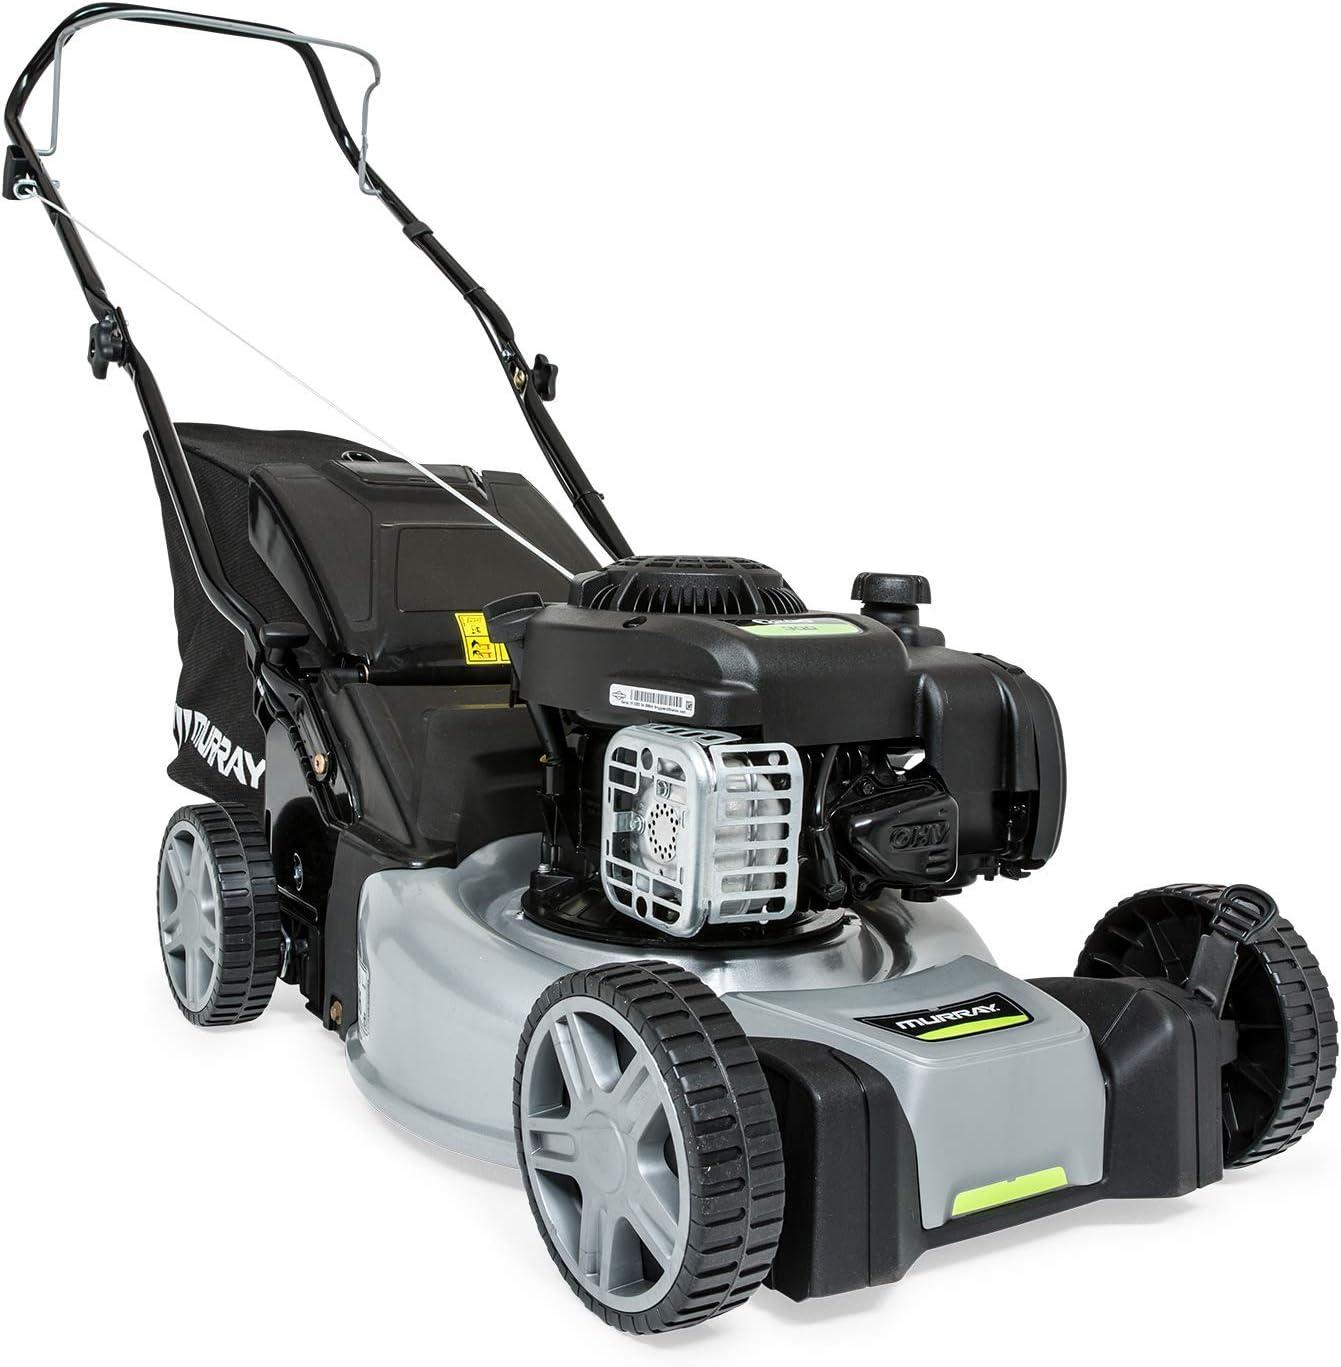 Murray EQ200 Petrol Lawn Mower, Push